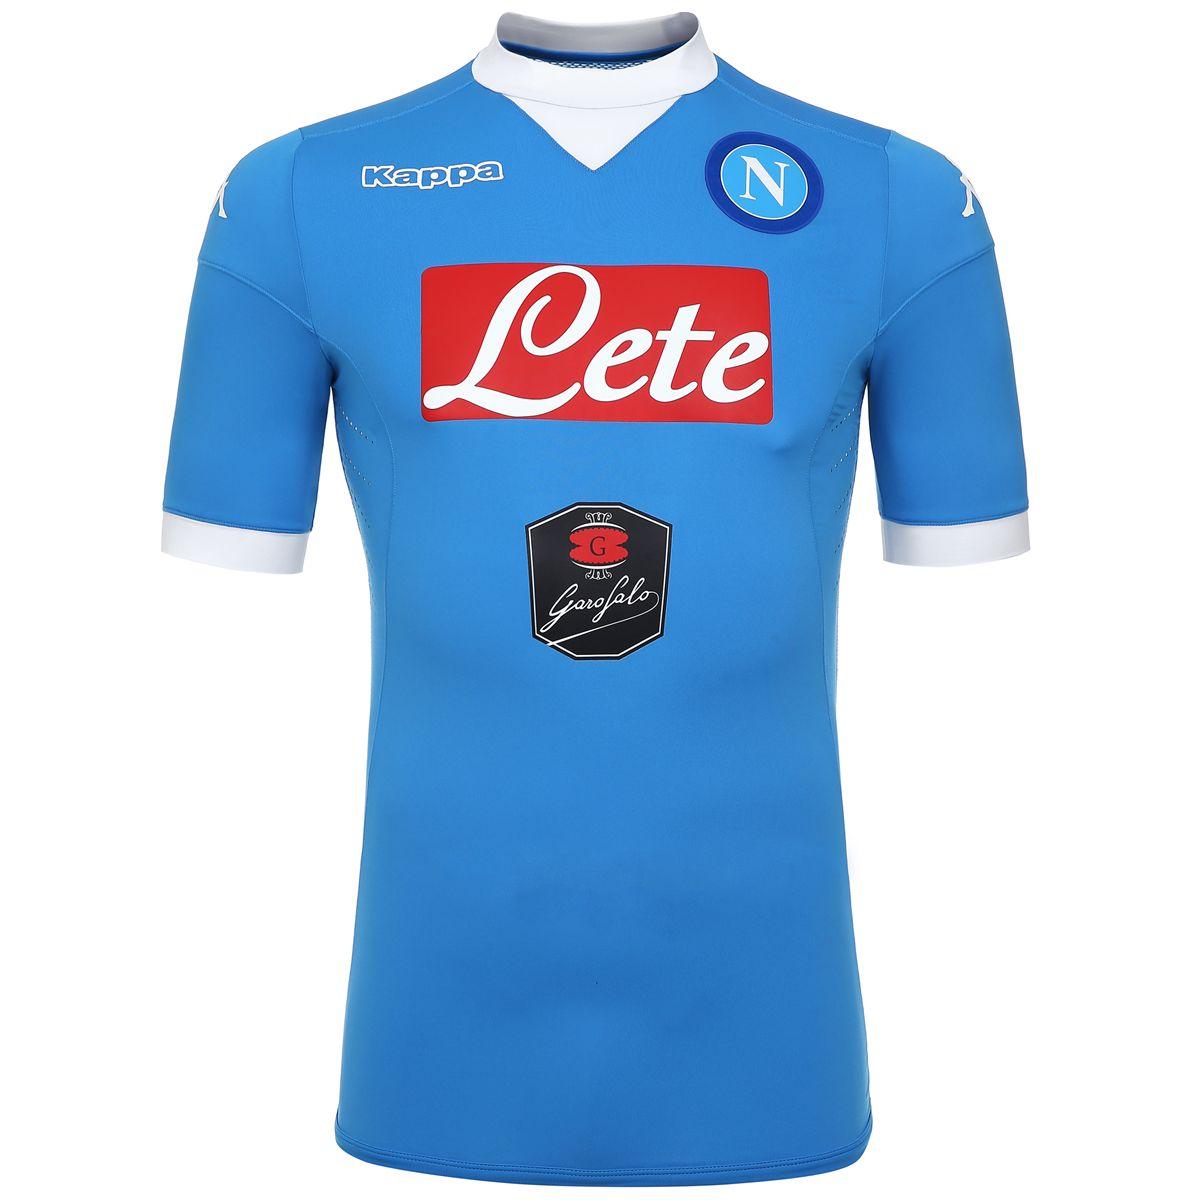 Kombat nuova maglia del Napoli